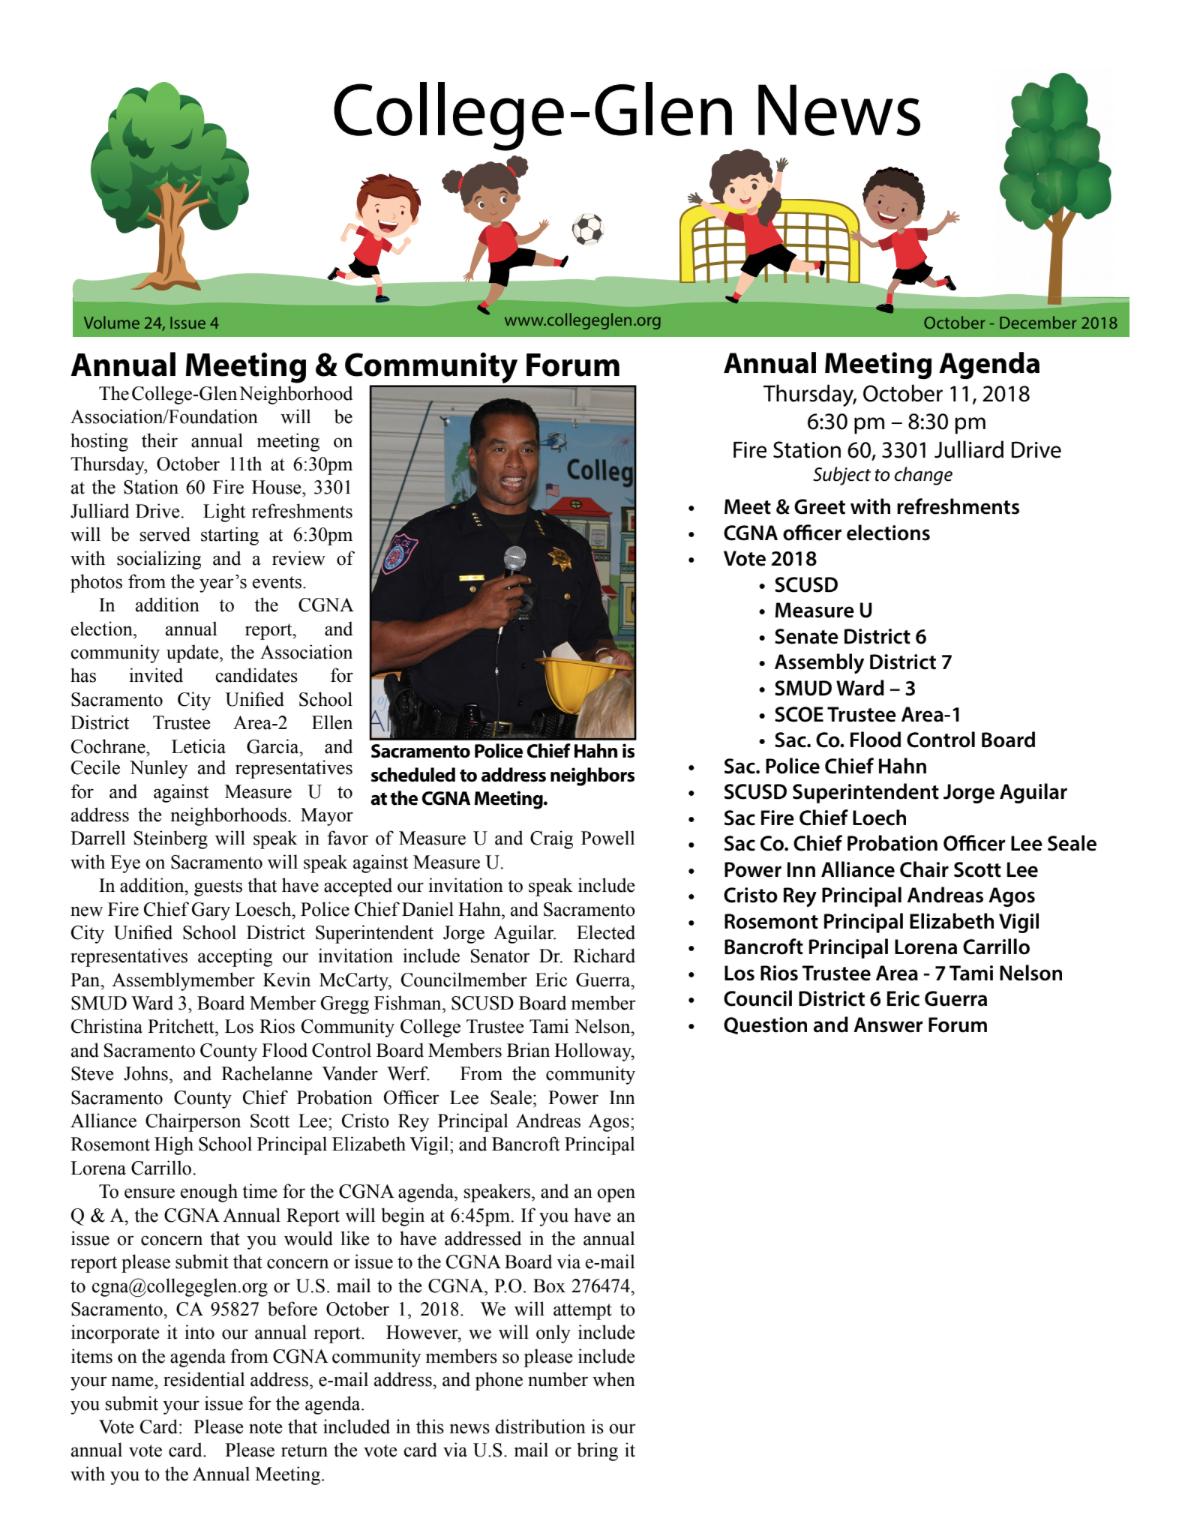 CG Annual Meeting 2018 copy.jpg